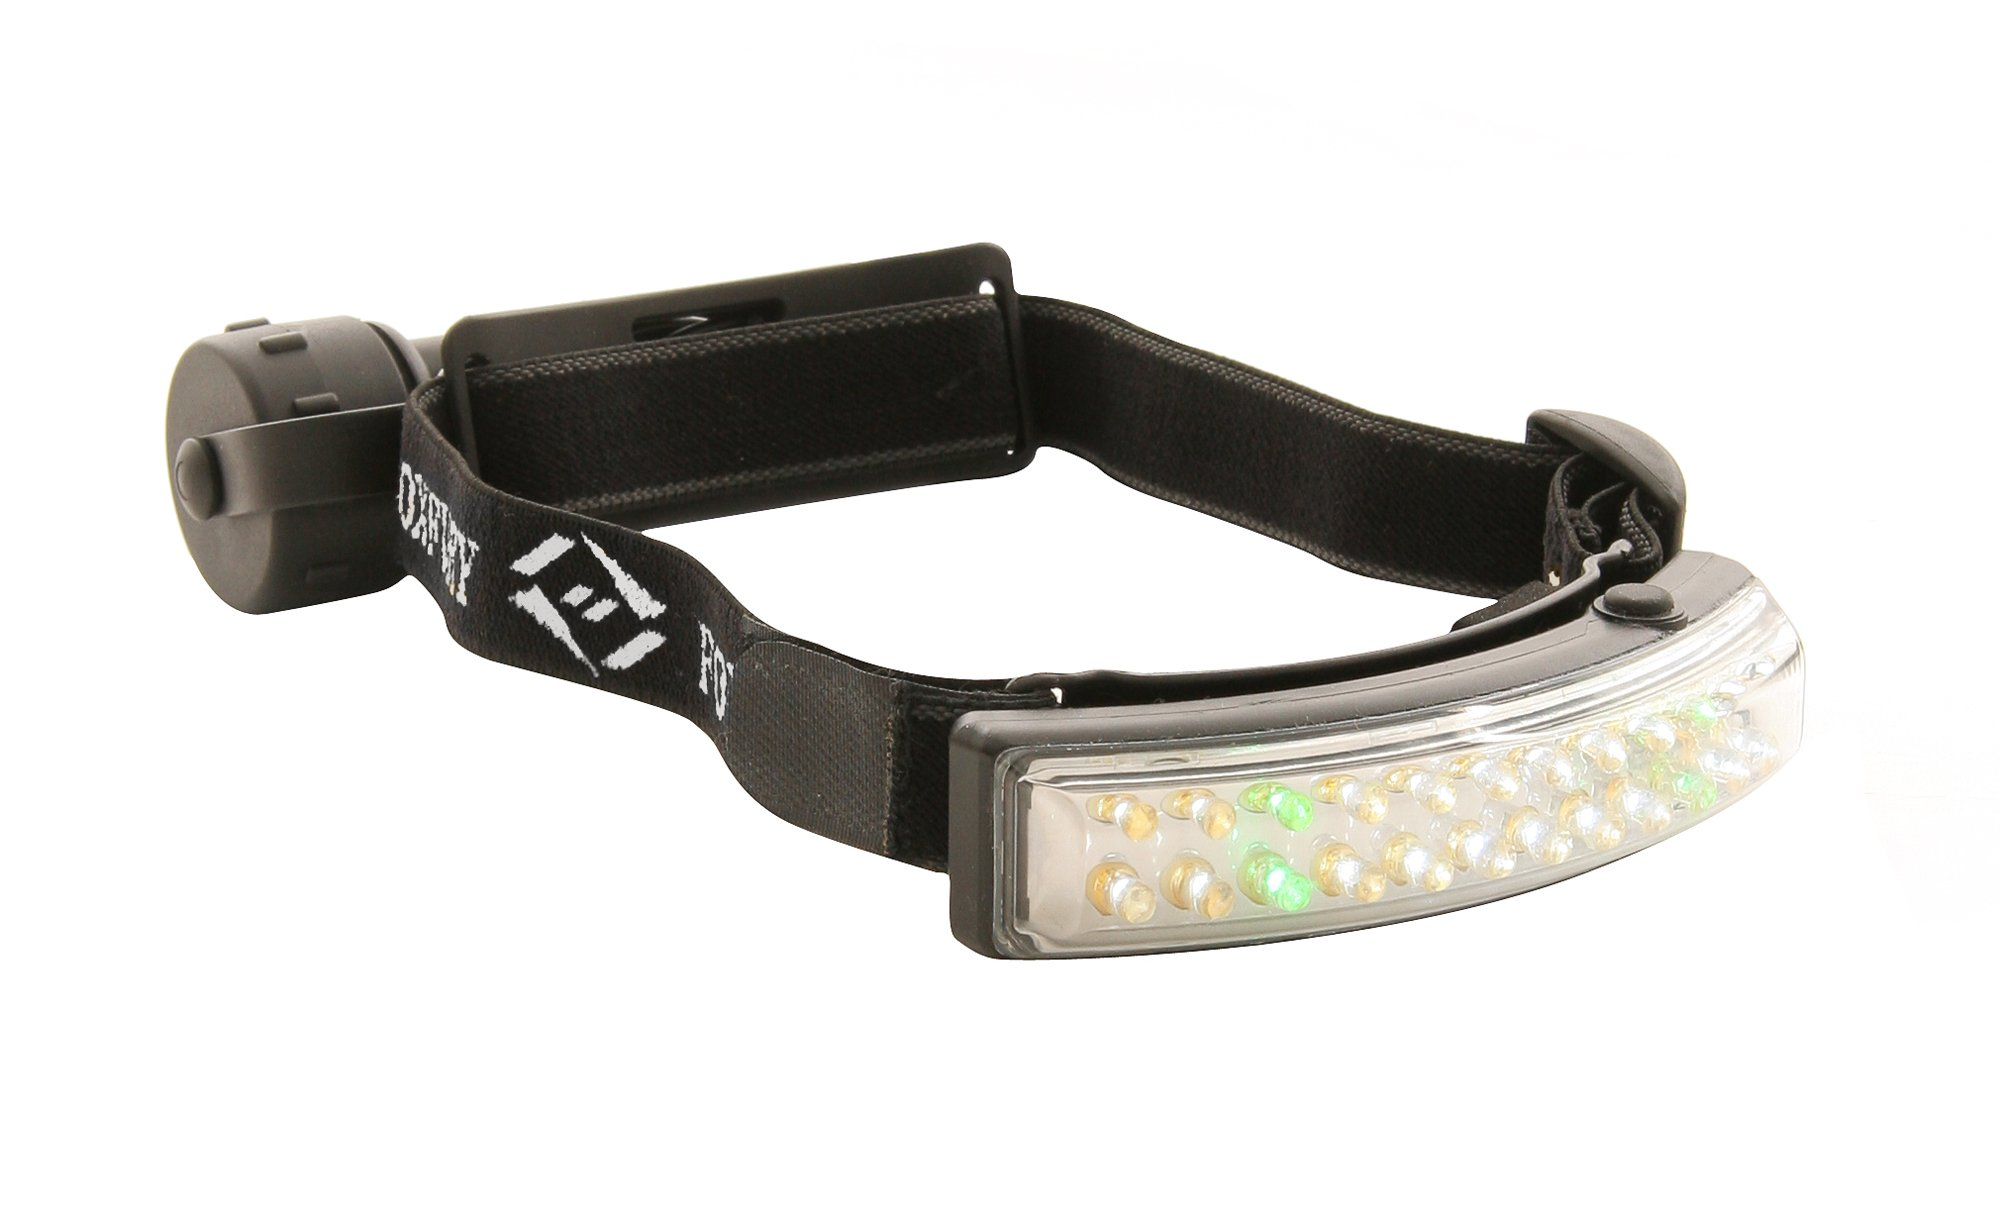 FoxFury 400-003 Performance Outdoor/Work LED Headlamp with Elastic Strap, 62 Lumens